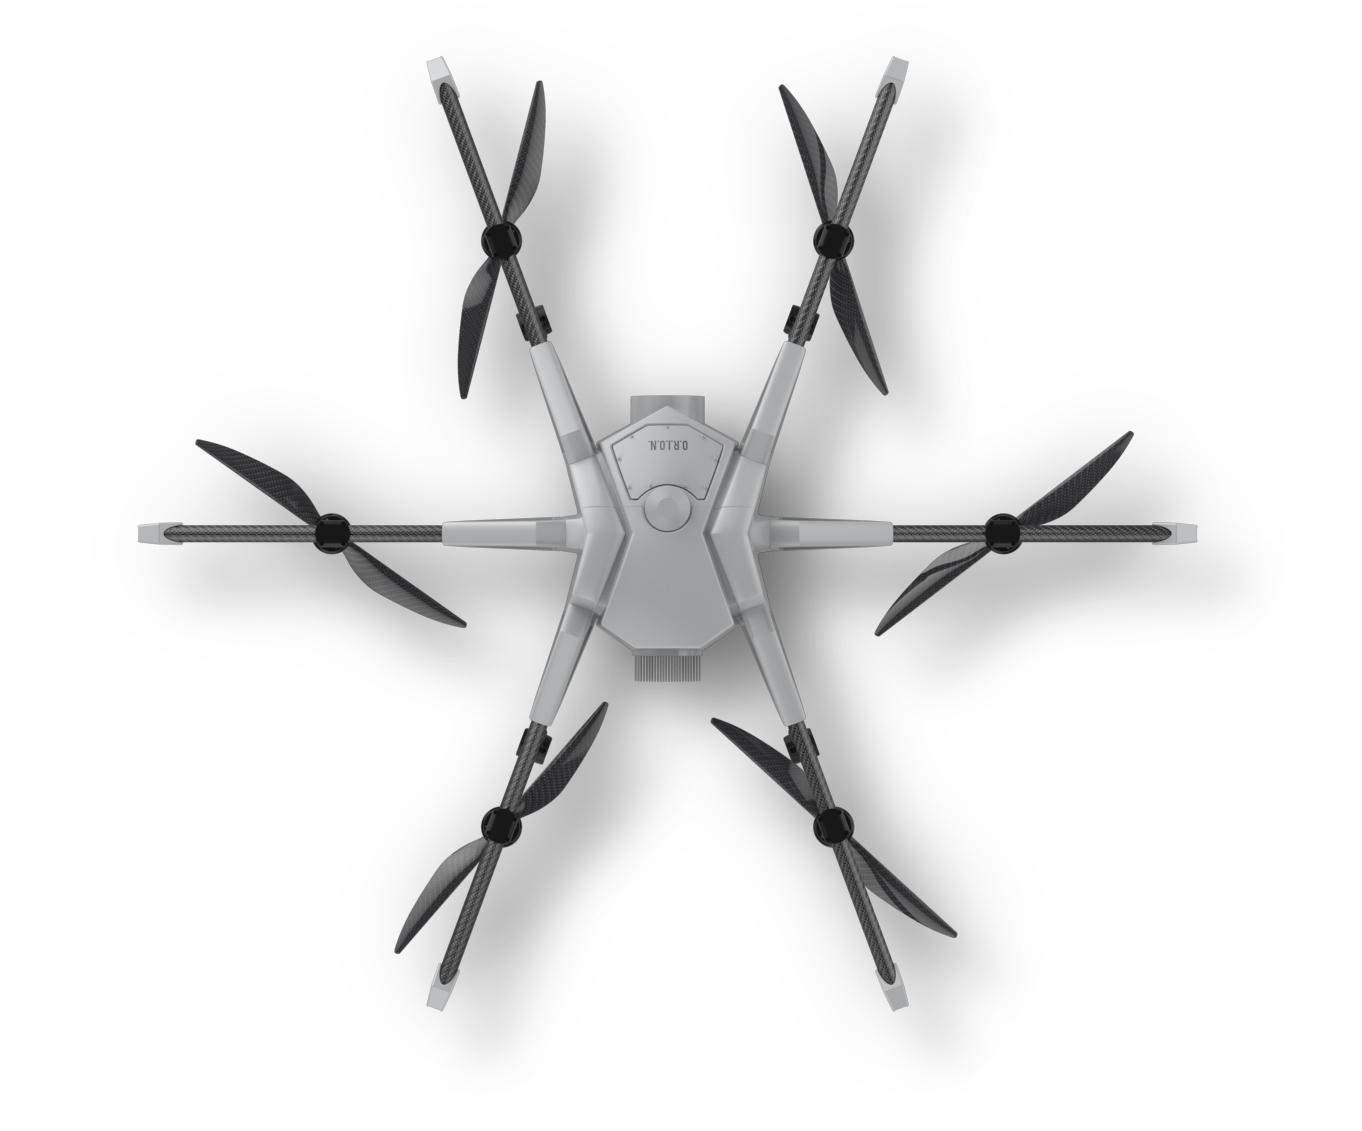 fnac drone parrot